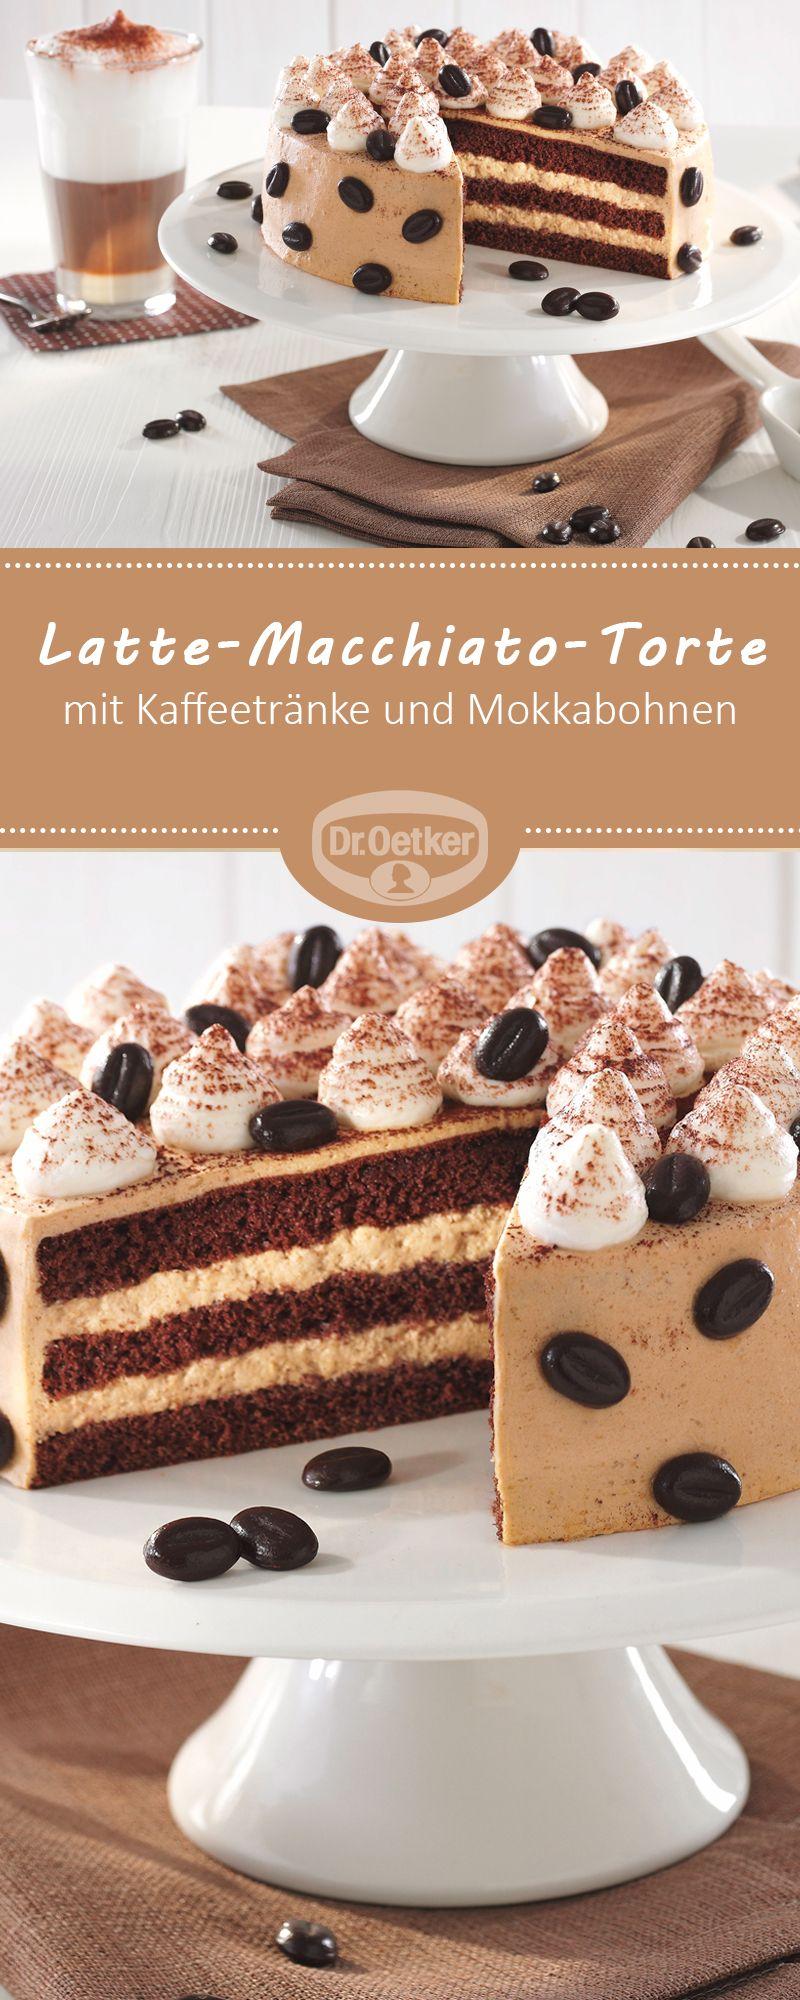 Kleine Latte-Macchiato-Torte #tortenrezepte